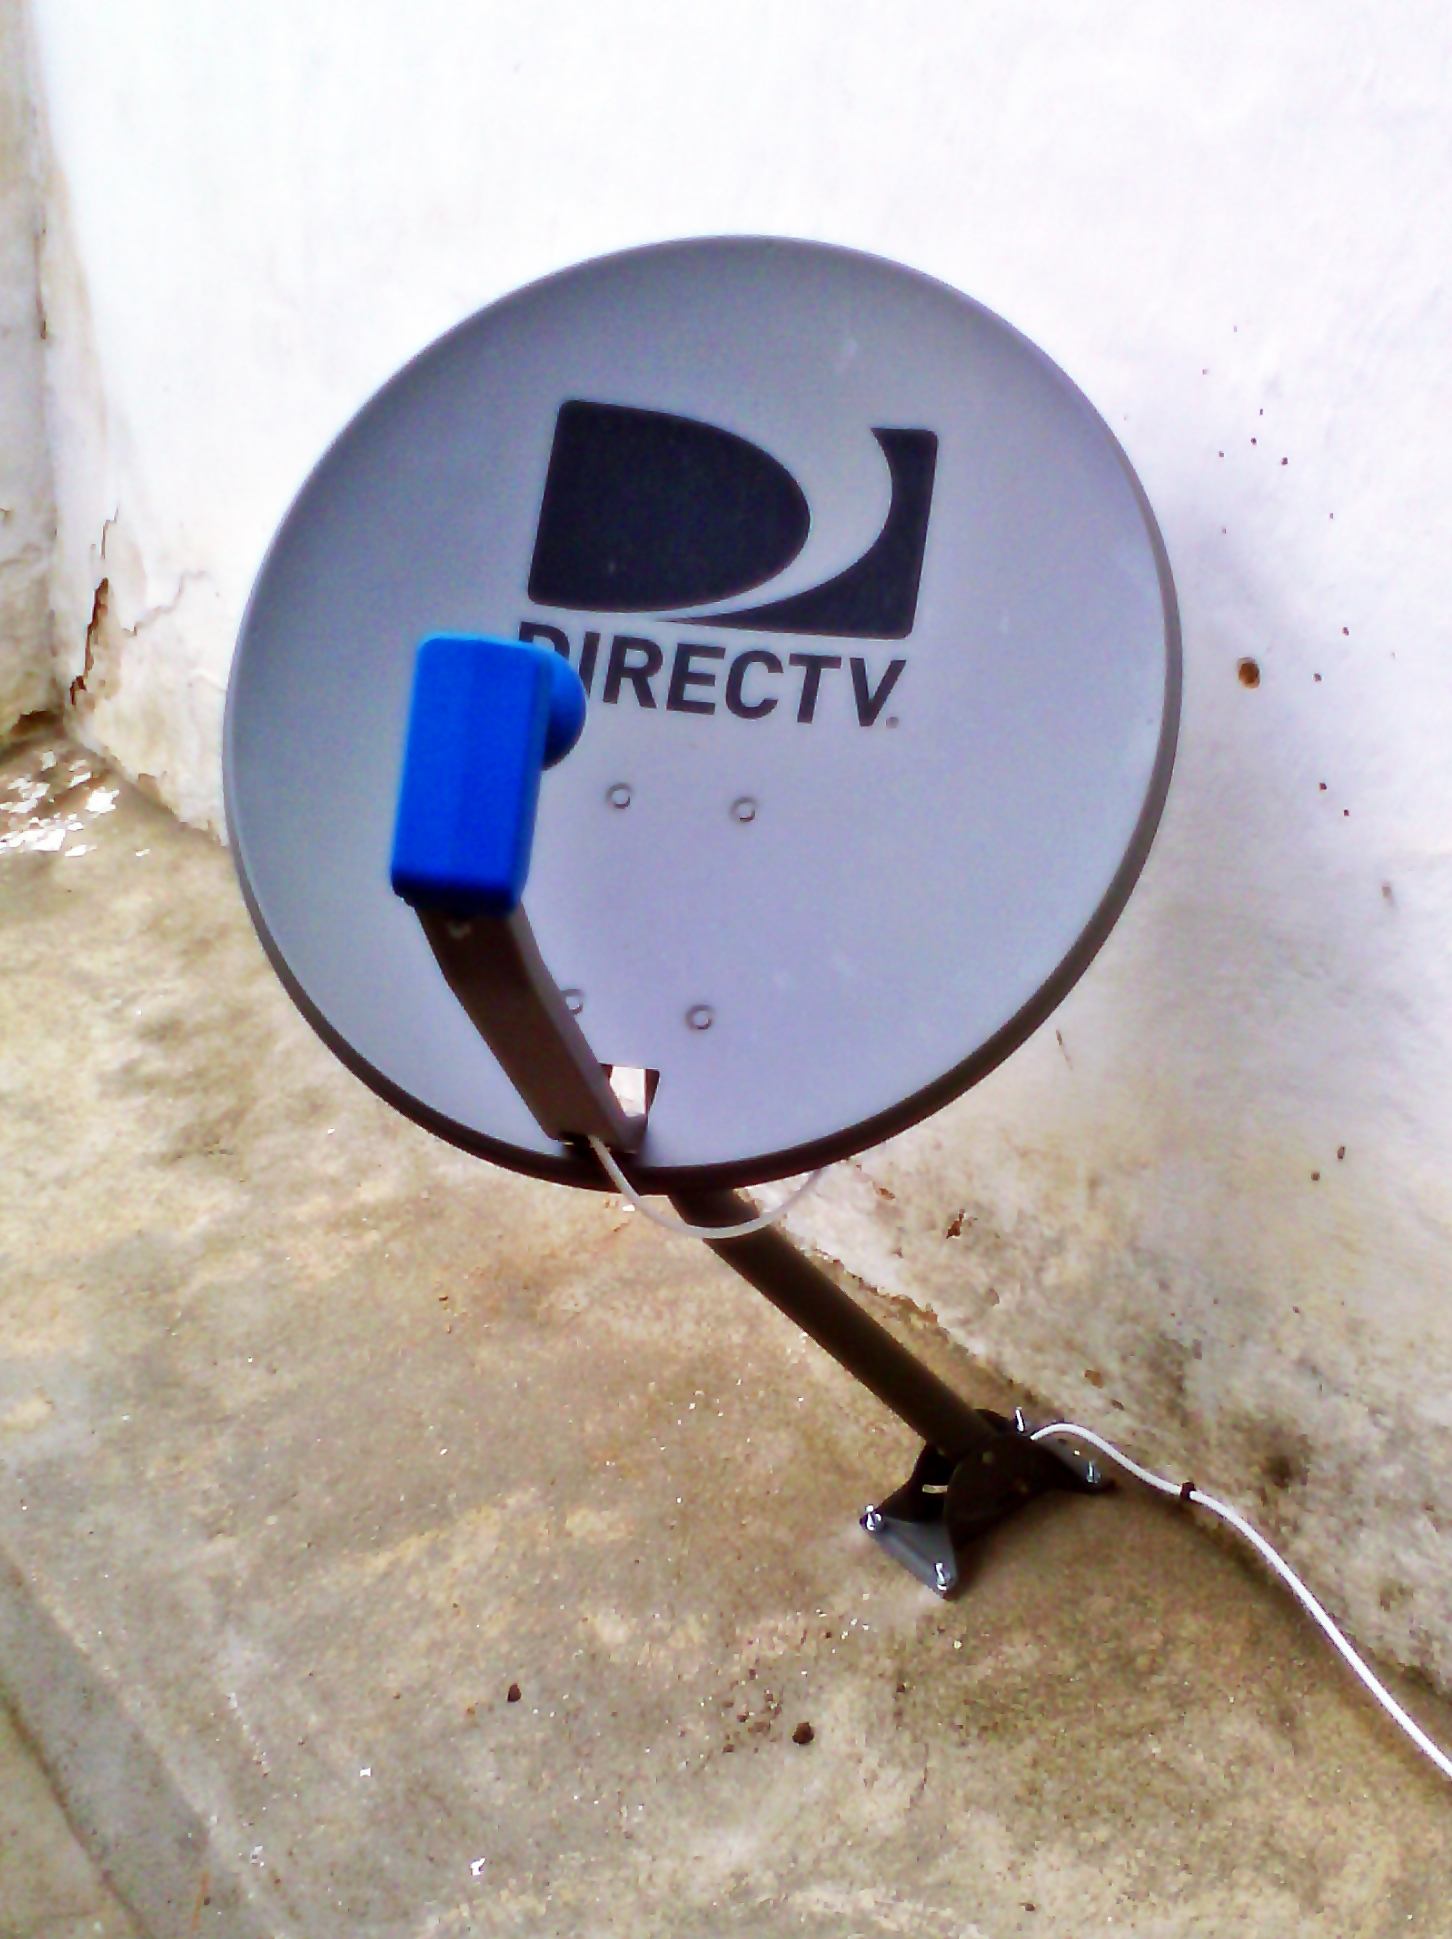 A control remoto - 1 5